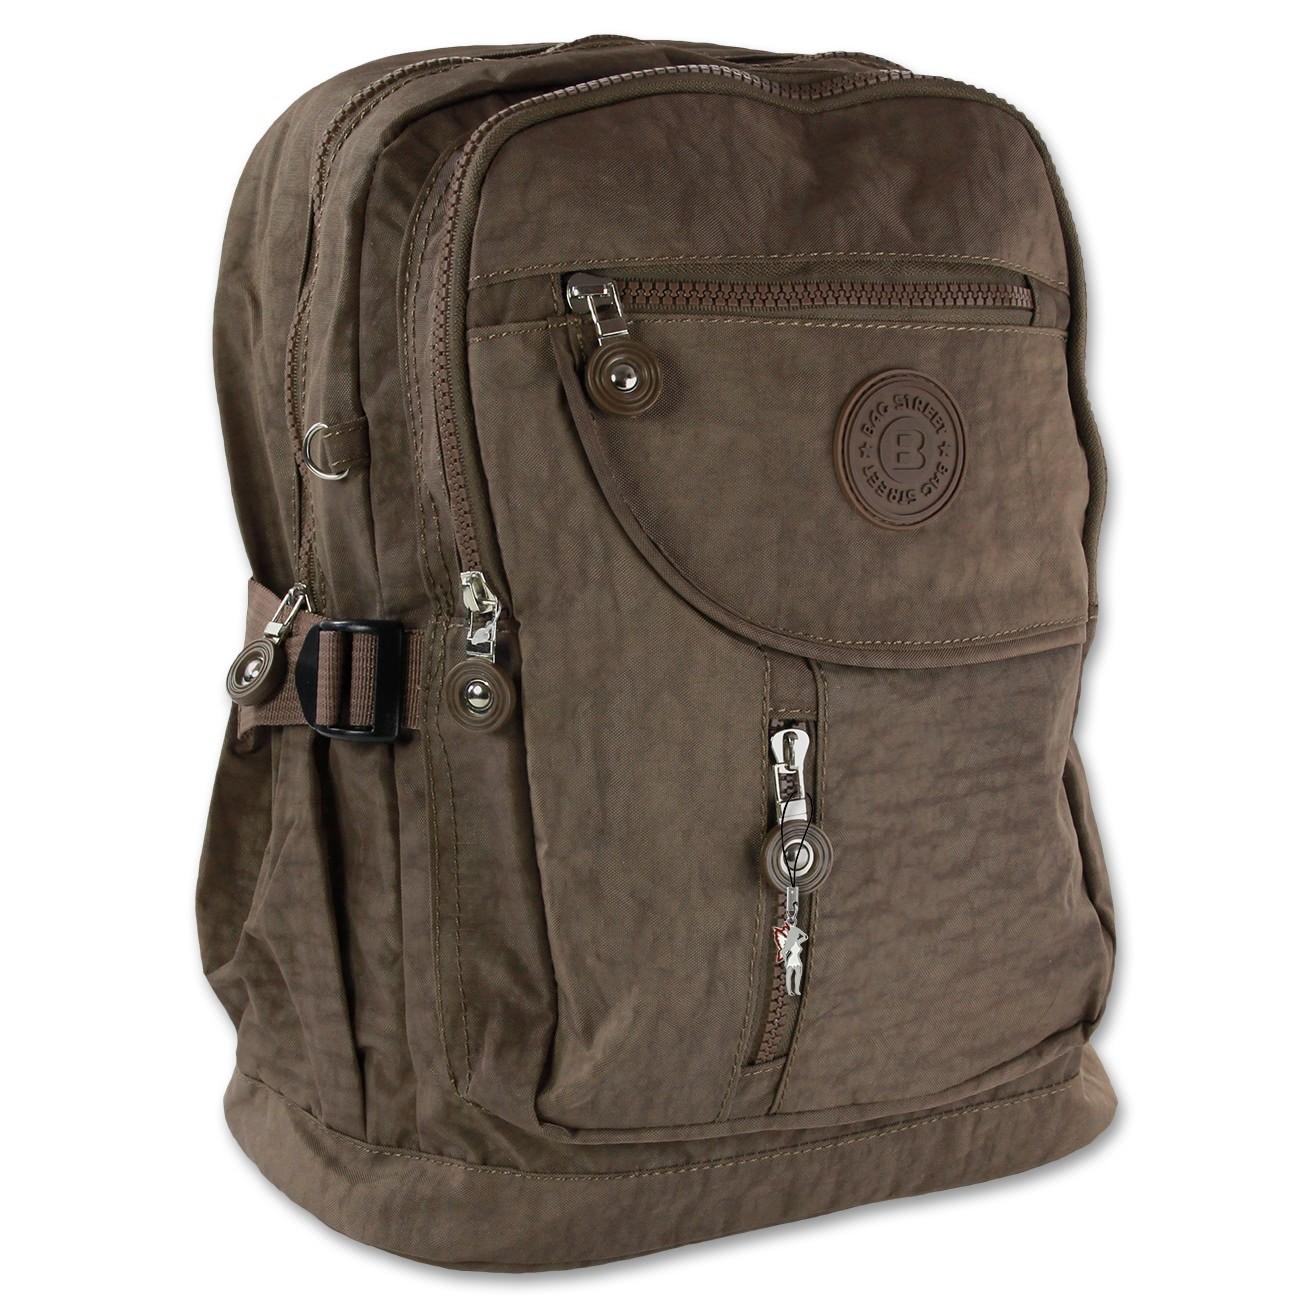 Rucksack Handtasche Nylon braun trendiger Damen Cityrucksack Bag Street OTJ604N